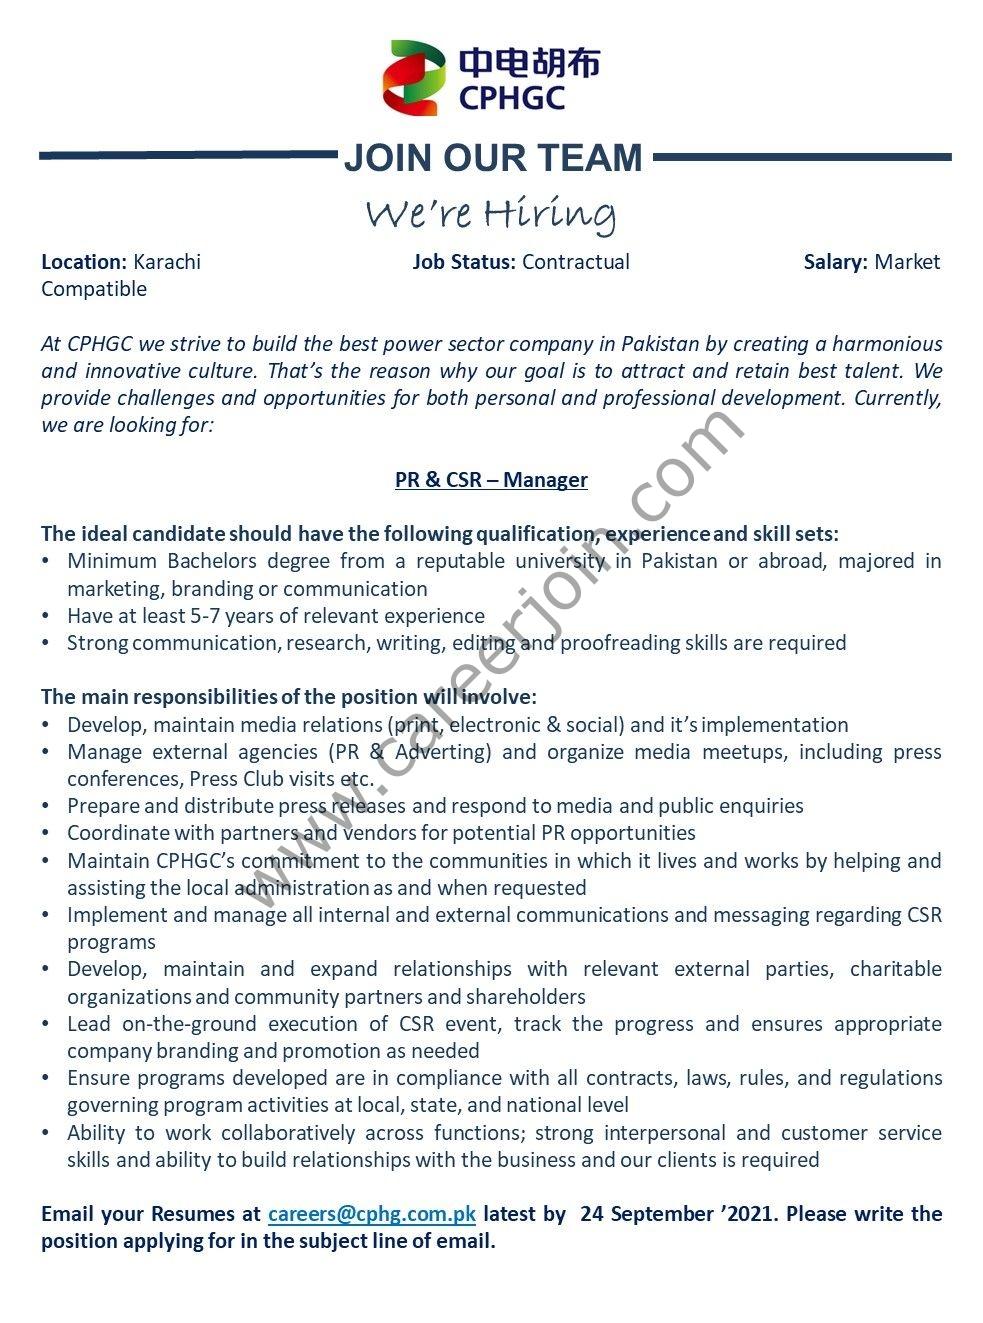 China Power Hub Generation Company Ltd CPHGC Jobs PR& CSR Manager